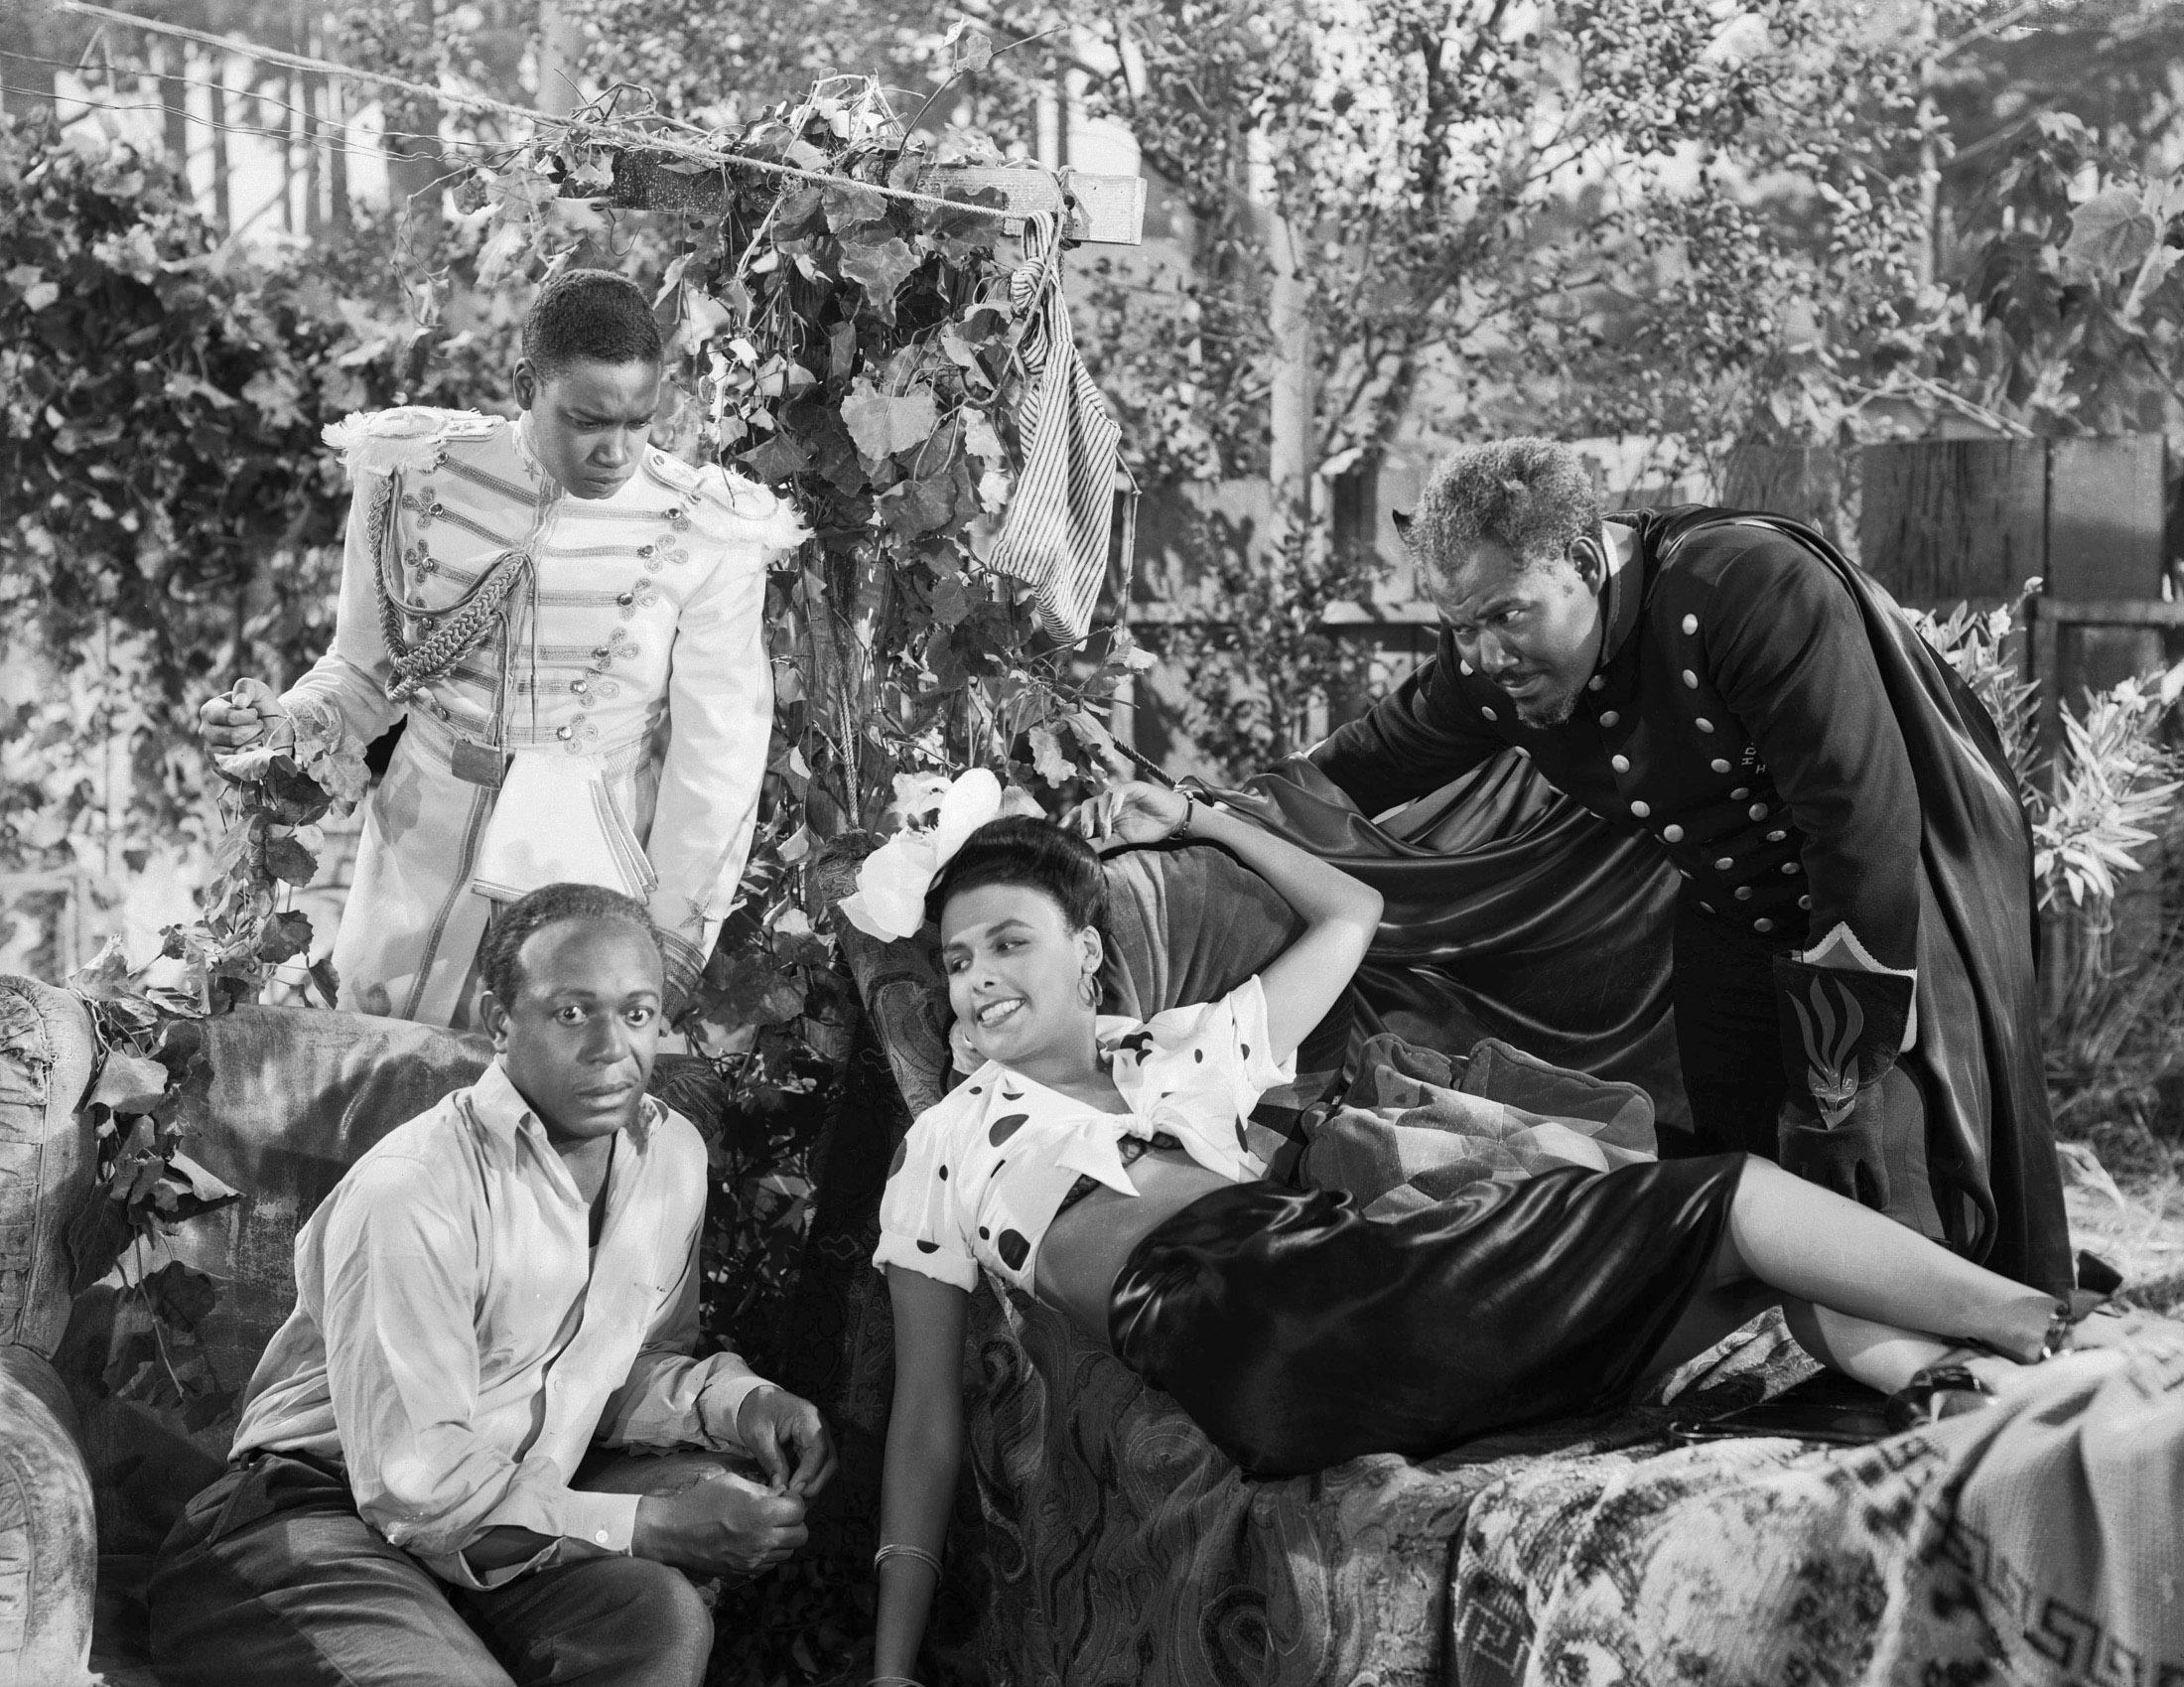 Lena Horne in Cabin in the Sky (L to R) Kenneth Spencer, Eddie